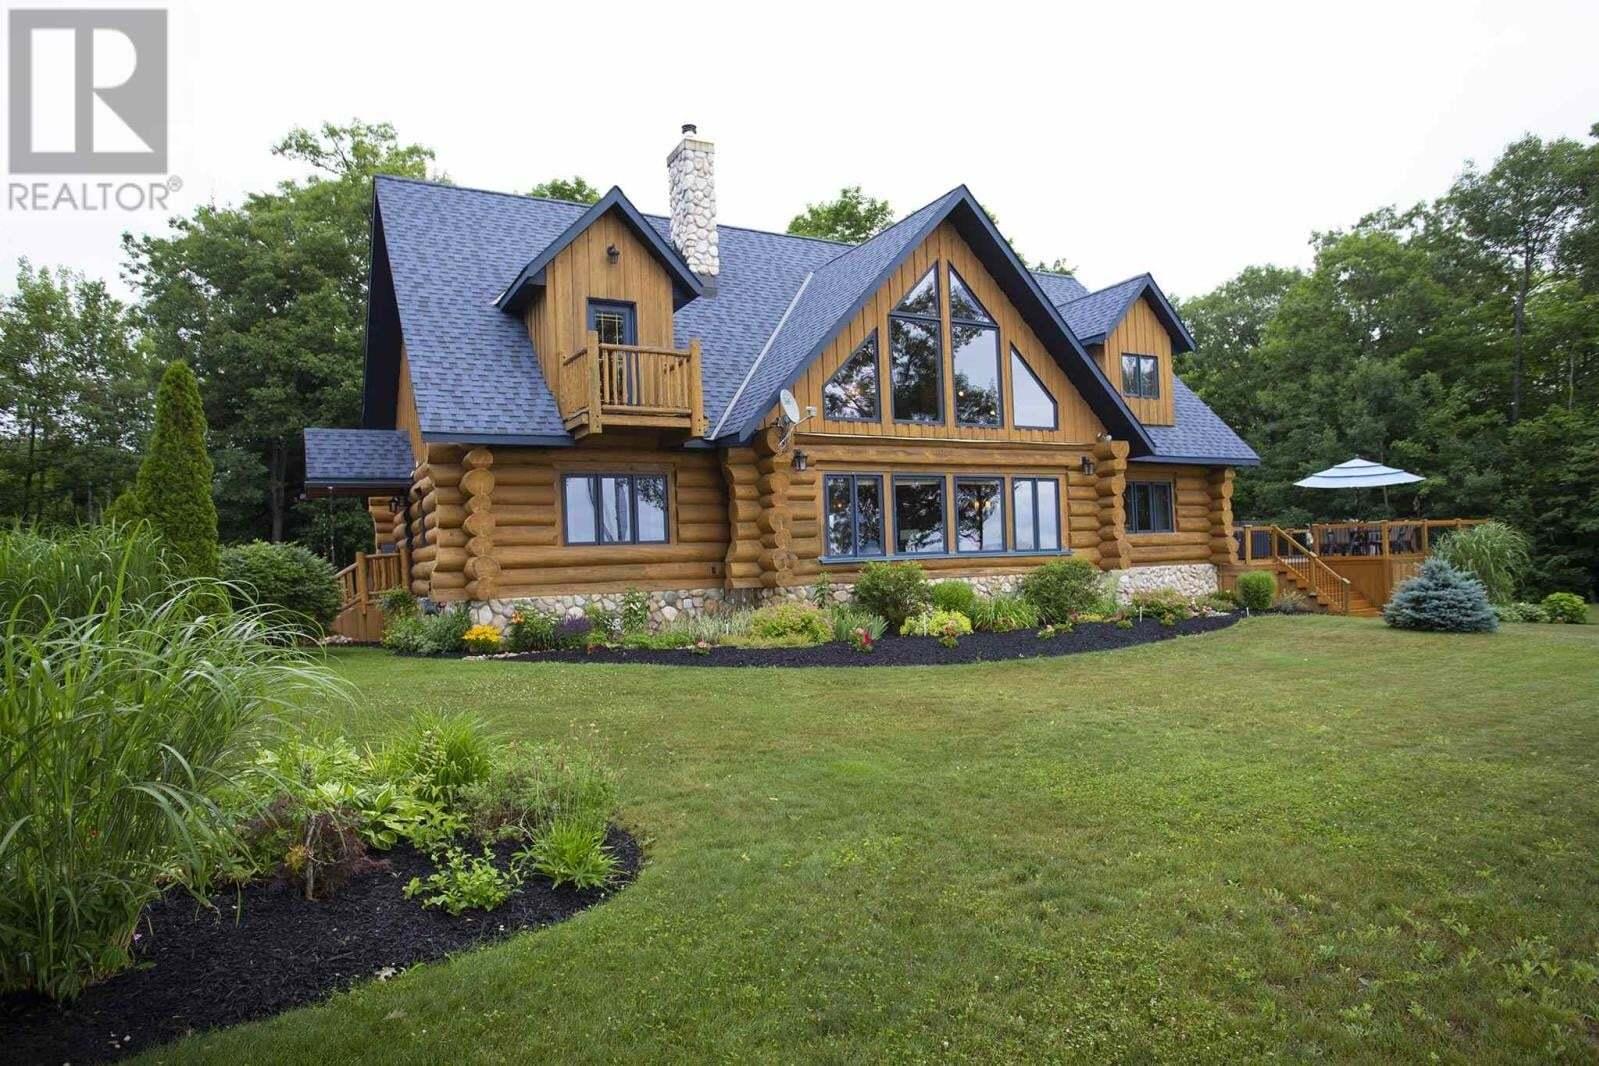 House for sale at 95 Oak Ridge Ln Sault Ste. Marie Ontario - MLS: SM129707